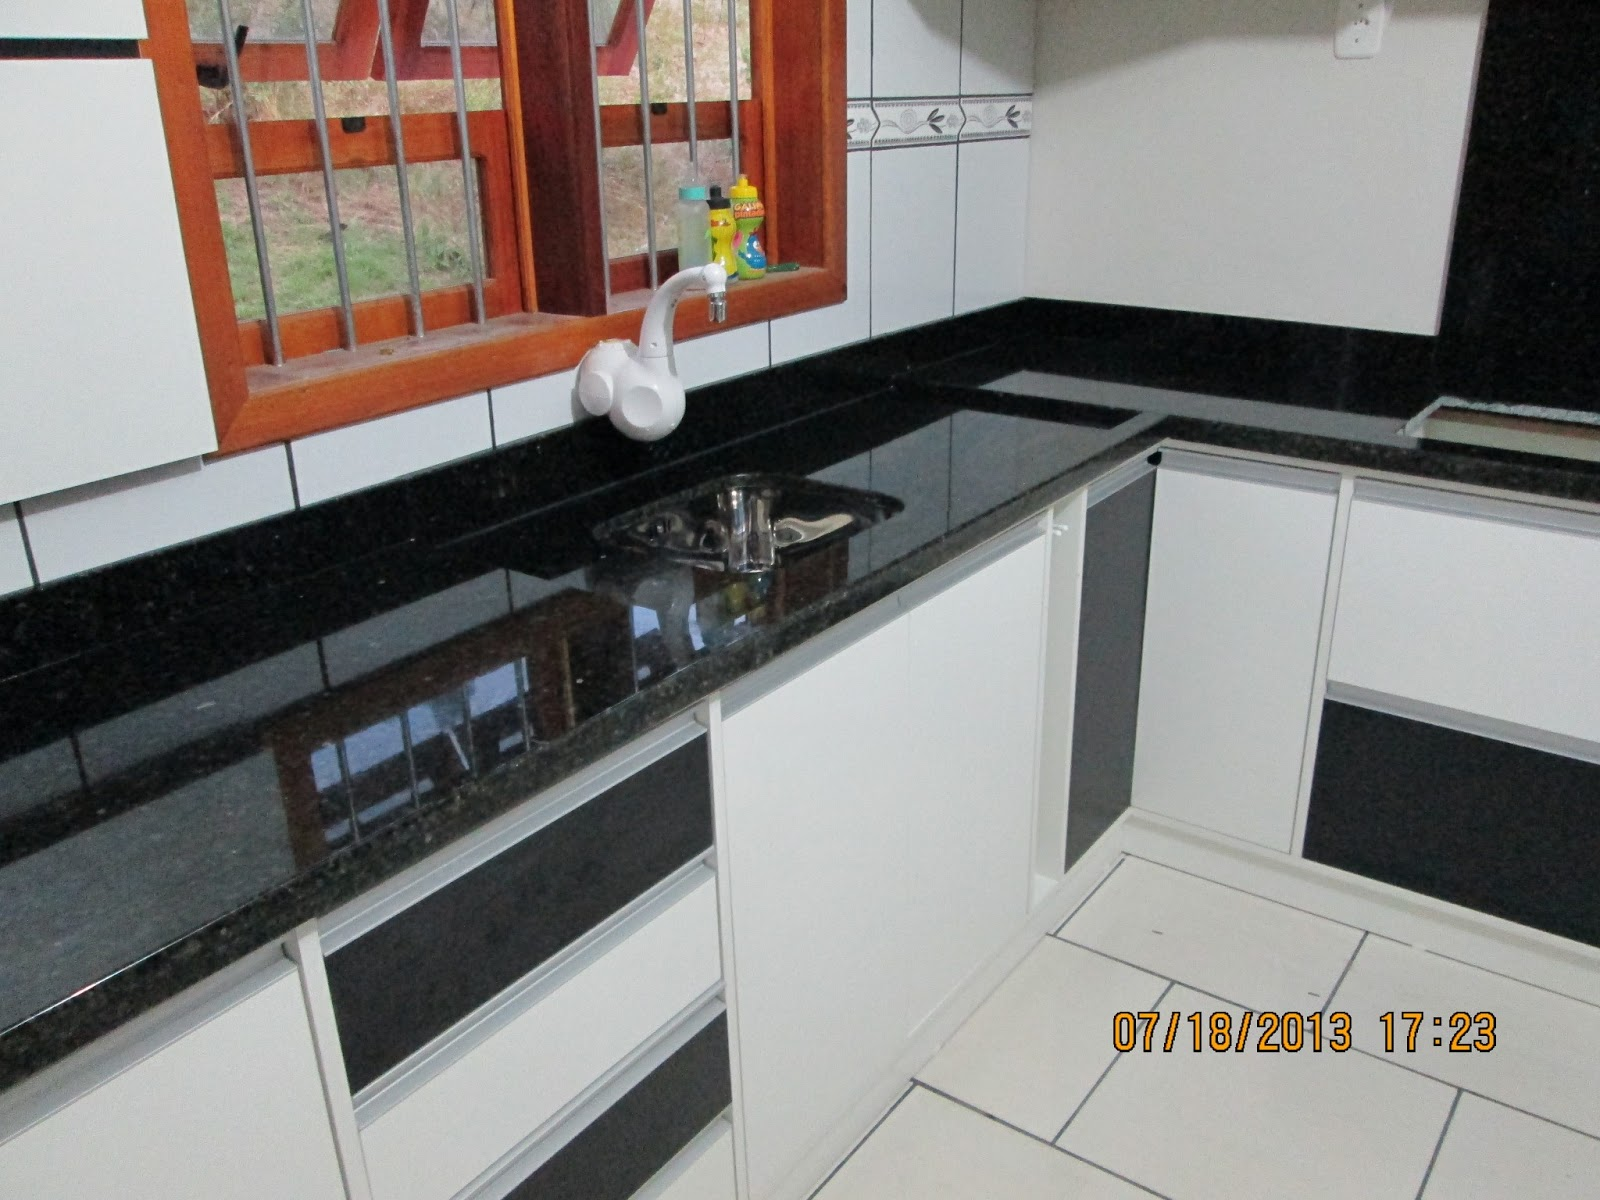 MARMORARIA CARDOZO: Cozinha de Granito Verde Ubatuba #883D29 1600x1200